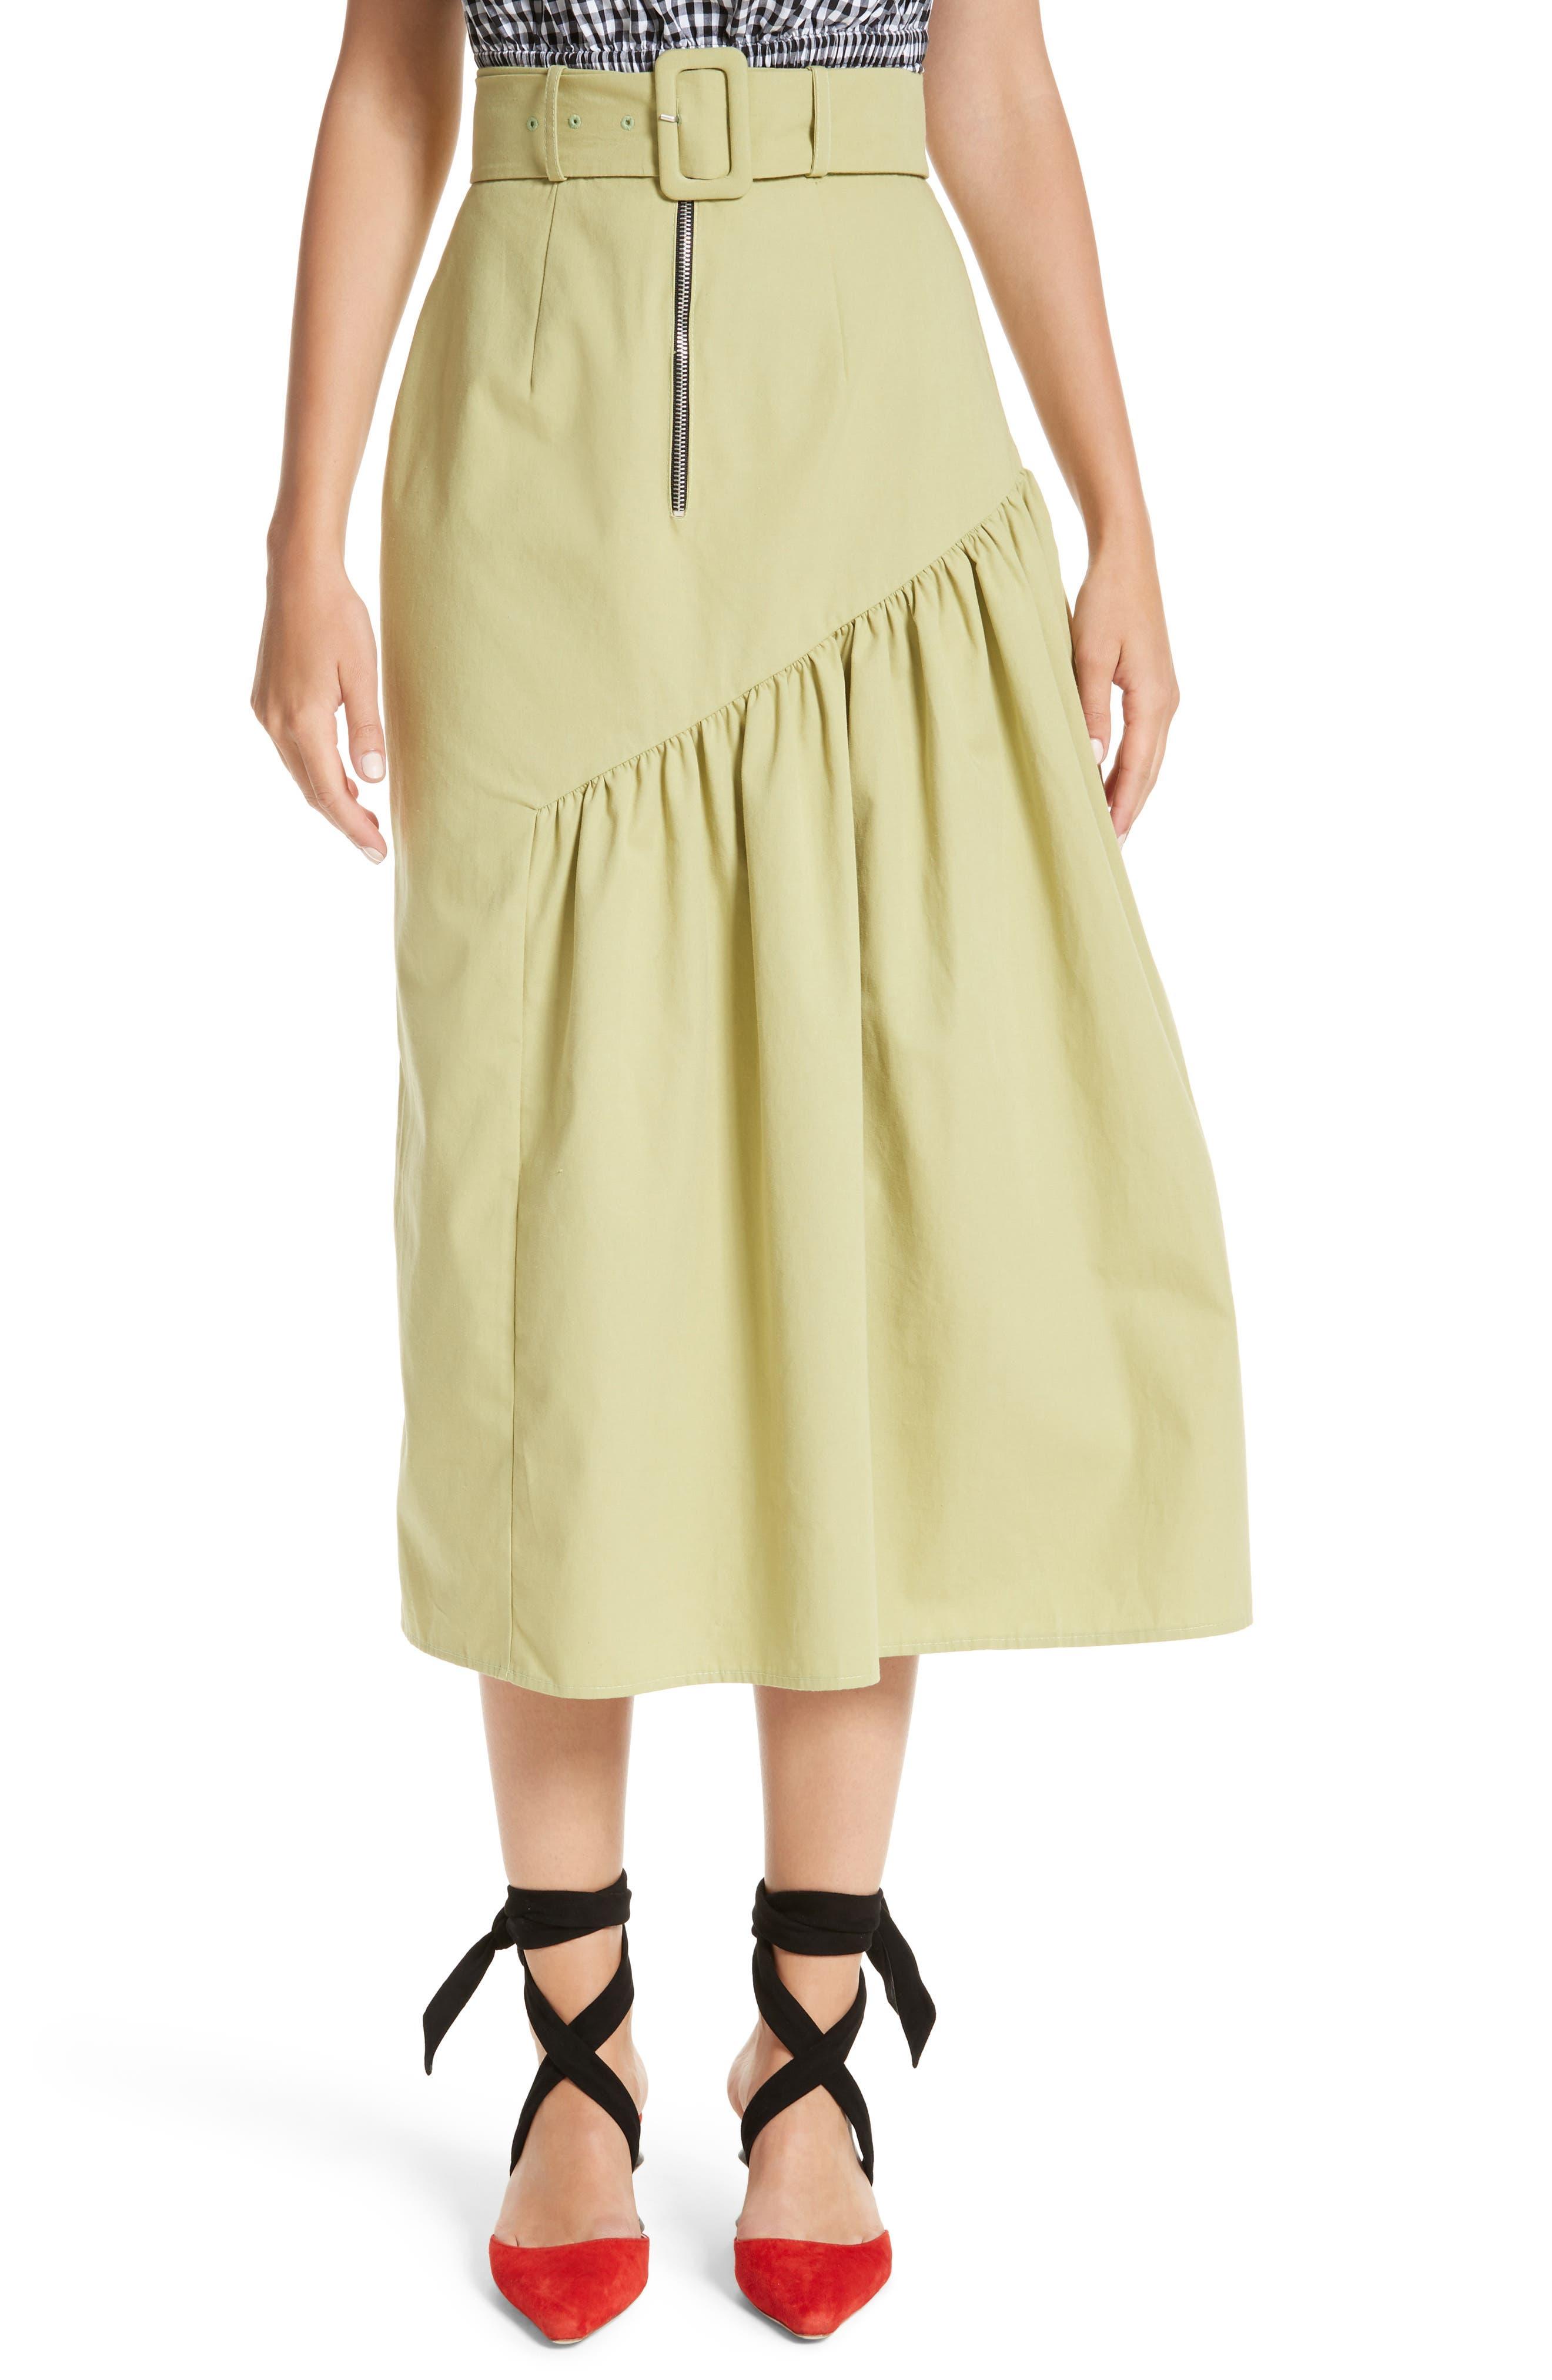 Rejina Pyo Belted High Waist Ruffle Skirt